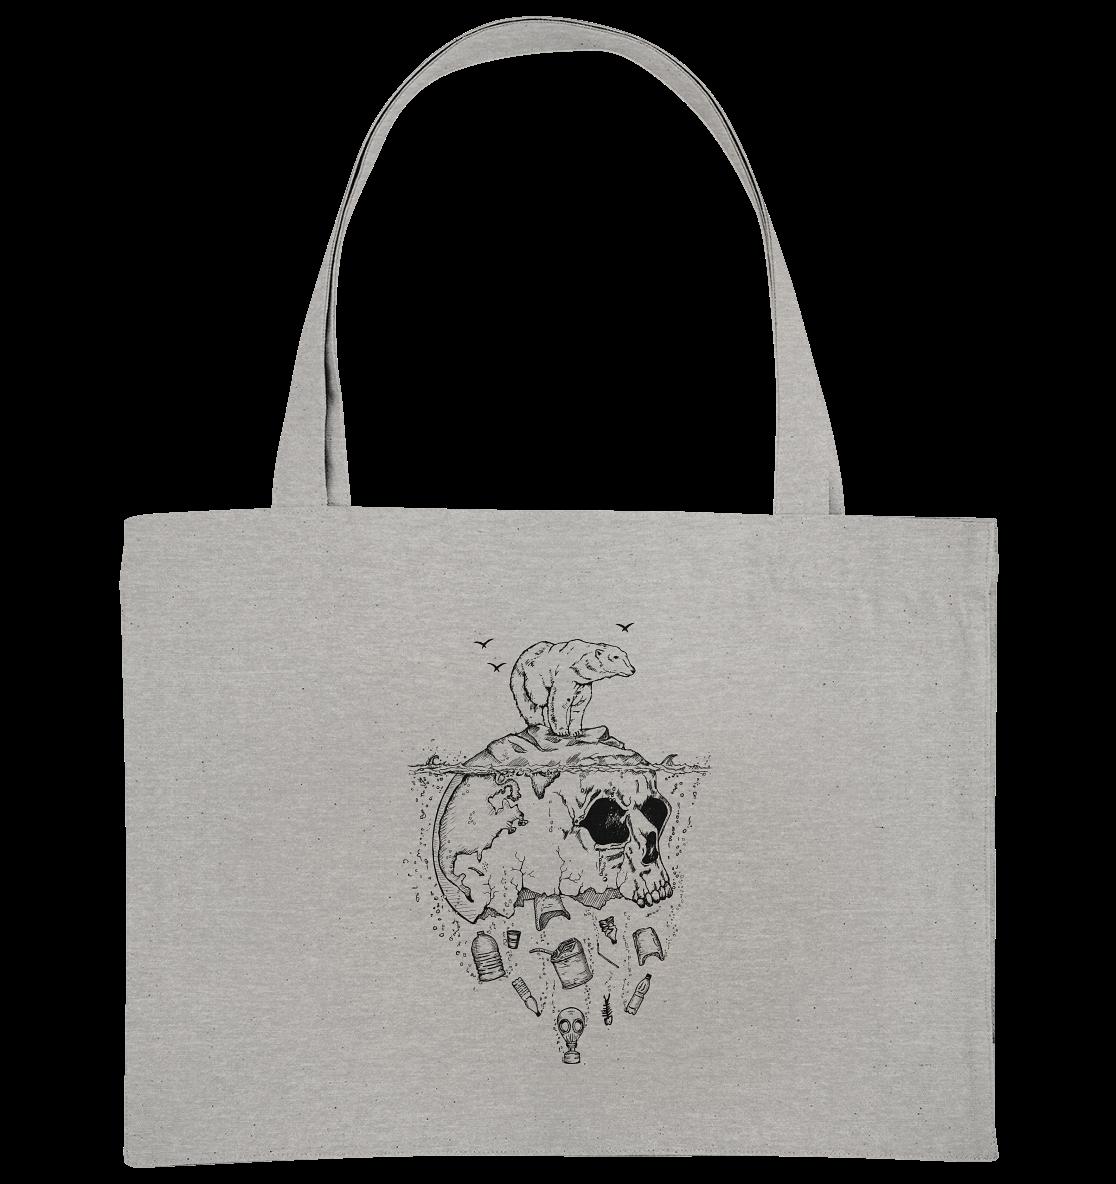 front-organic-shopping-bag-c2c1c0-1116x-1.png